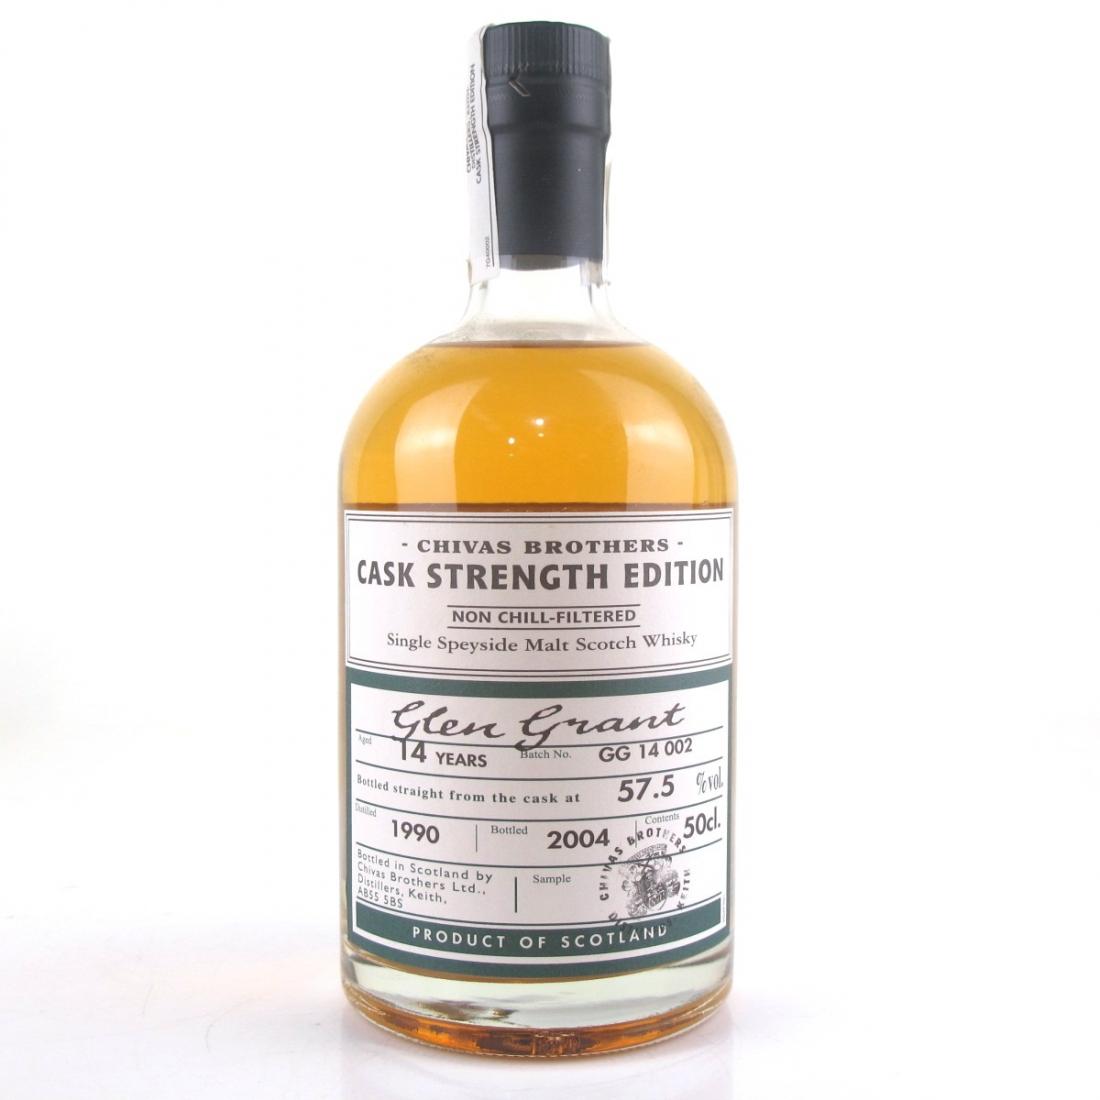 Glen Grant 1990 Cask Strength 14 Year Old / Distillery Exclusive